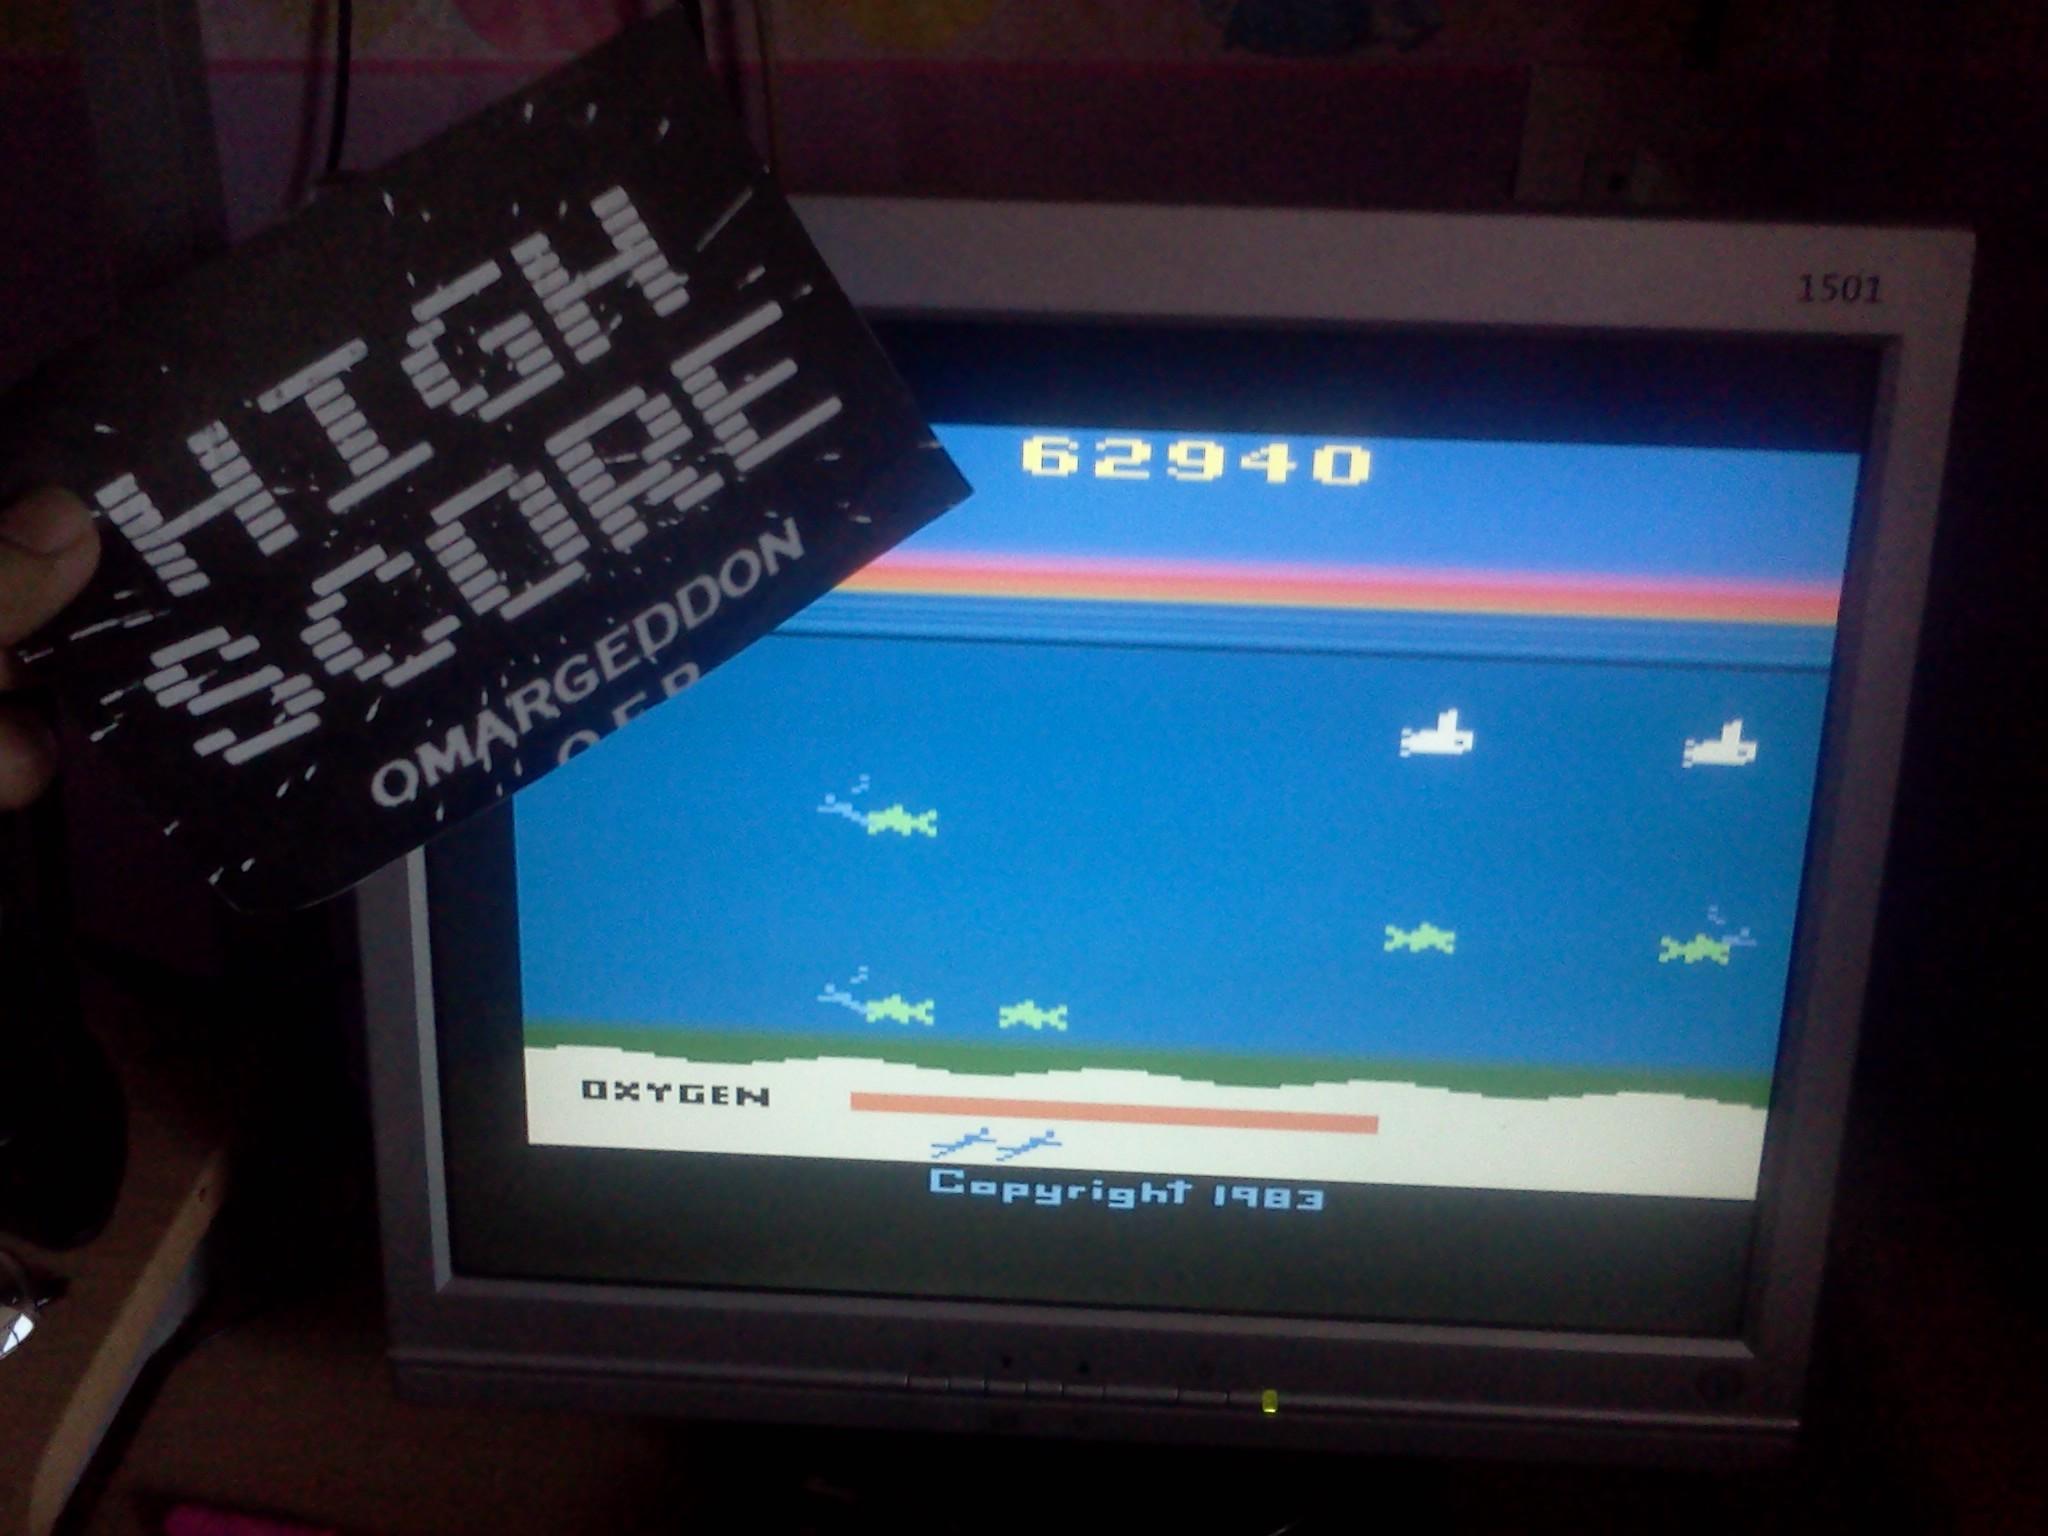 omargeddon: Seaquest (Atari 2600 Emulated Novice/B Mode) 62,940 points on 2016-08-31 16:58:53